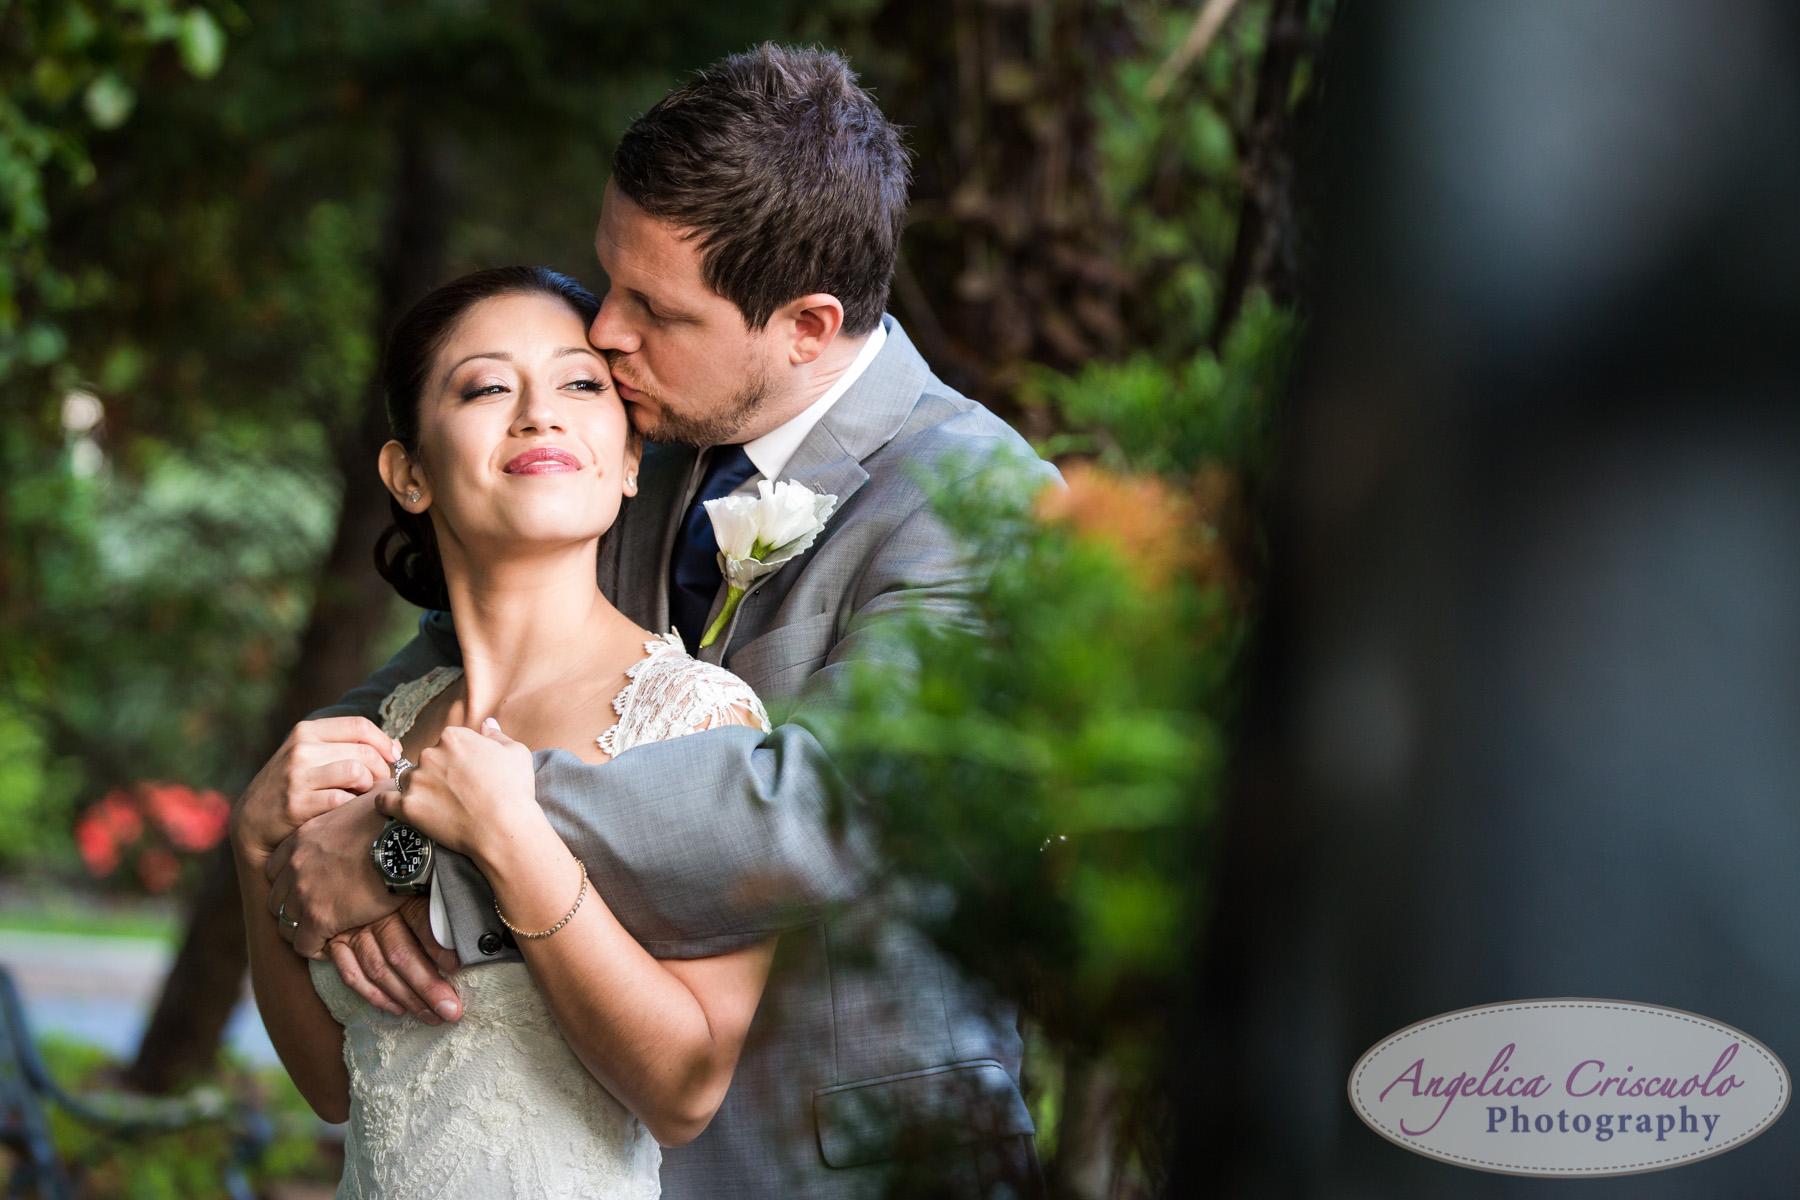 Bride and groom wedding photo ideas New York